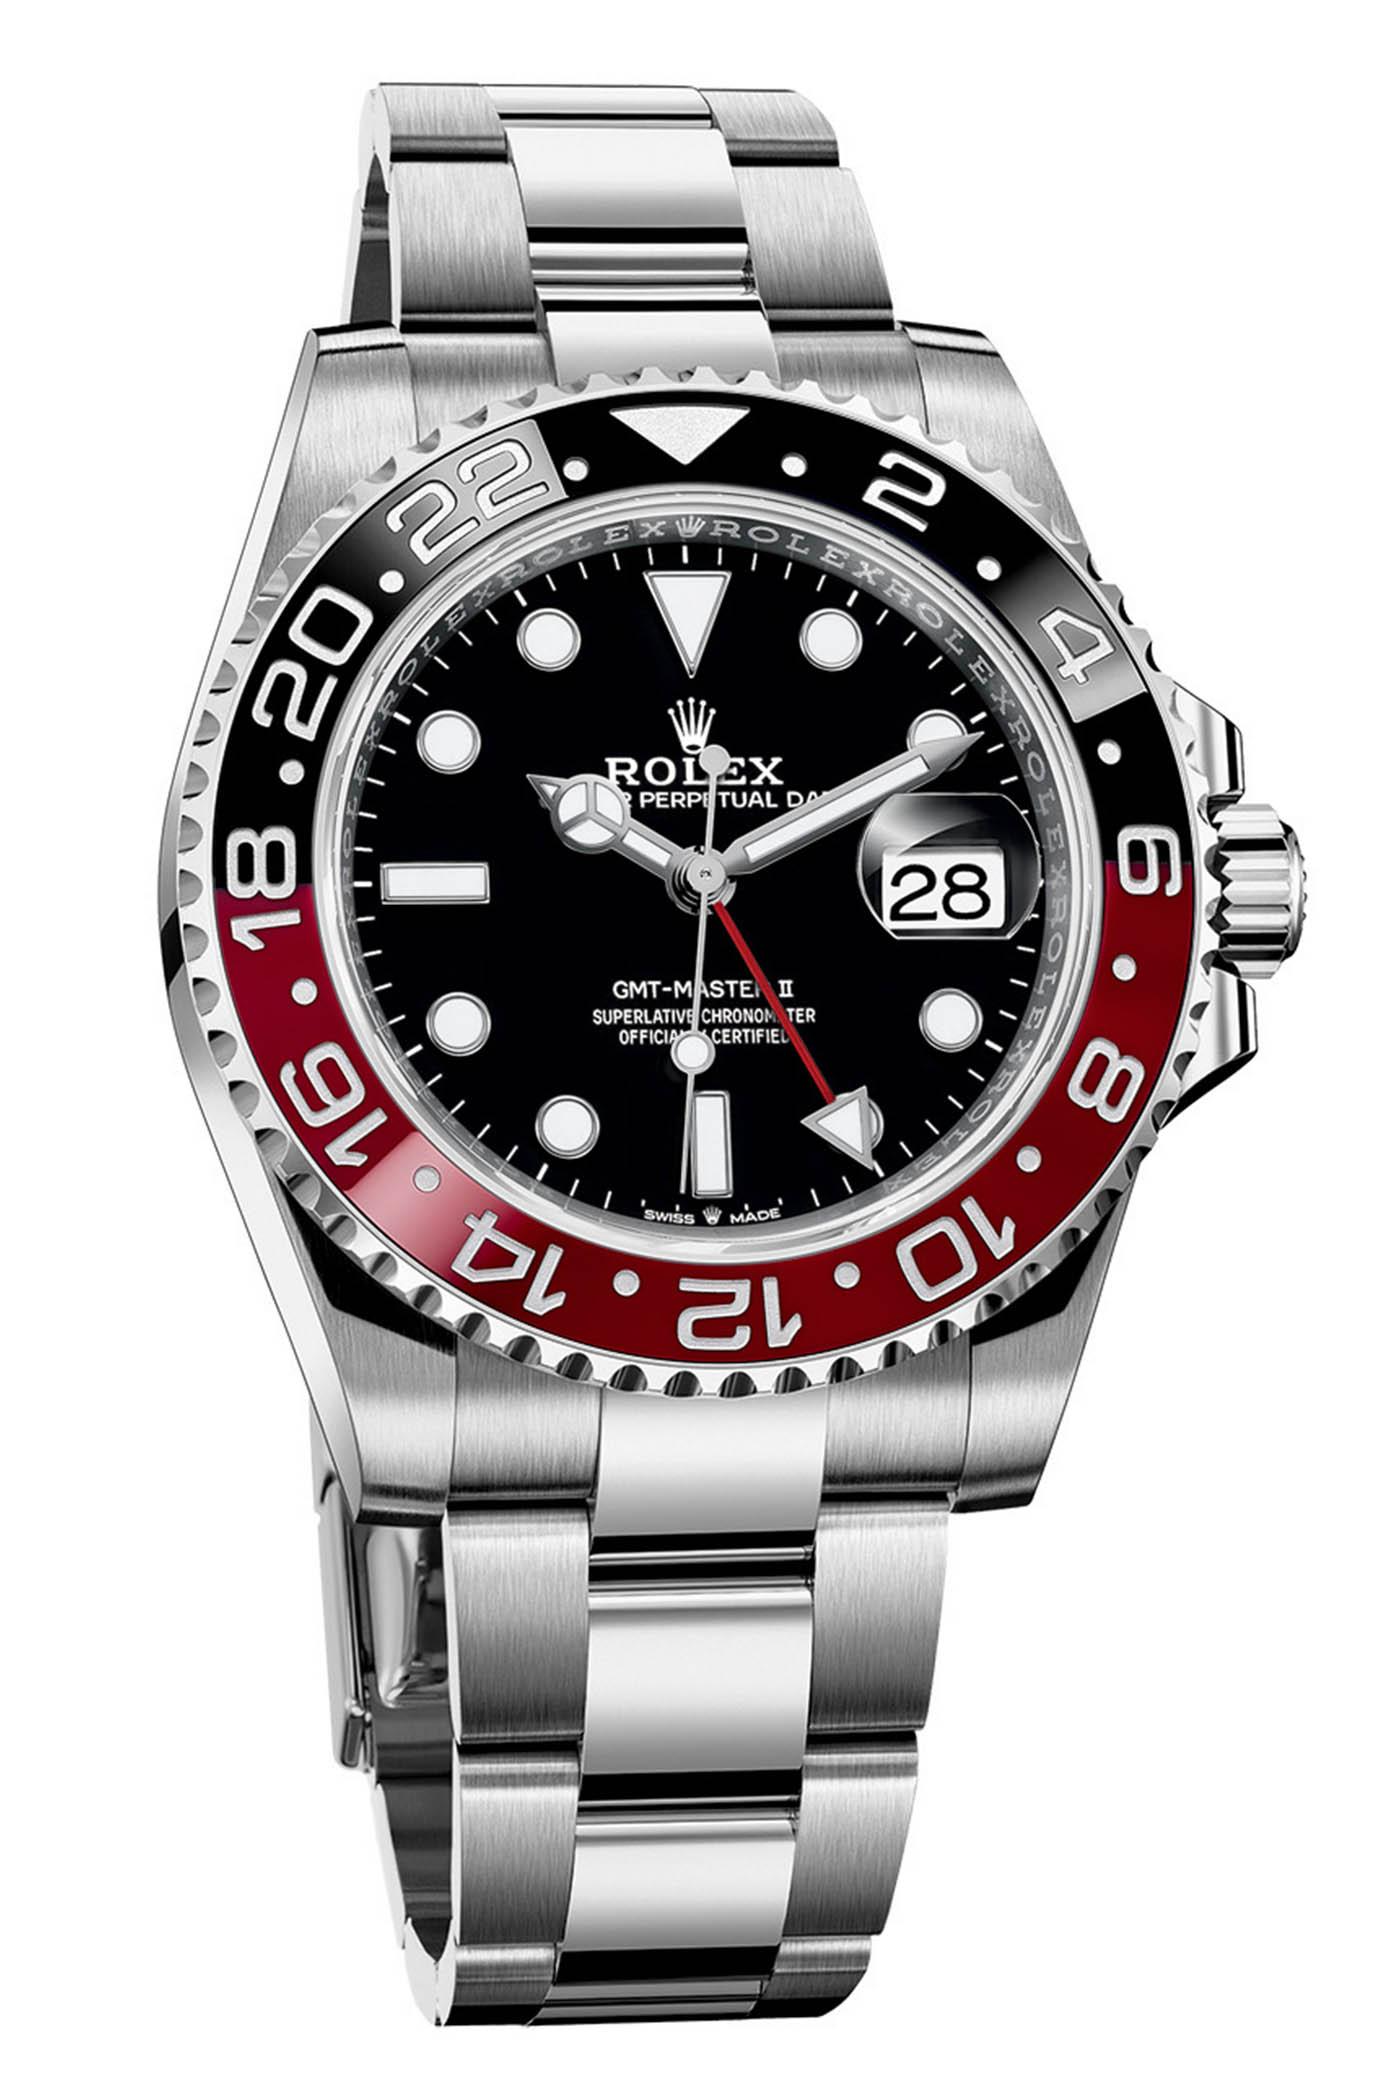 Rolex GMT Master II Coke Black-red Bezel Jubilee Calibre 3285 ref 126710RONR - Rolex Baselworld 2019 - Rolex 2019 Predictions